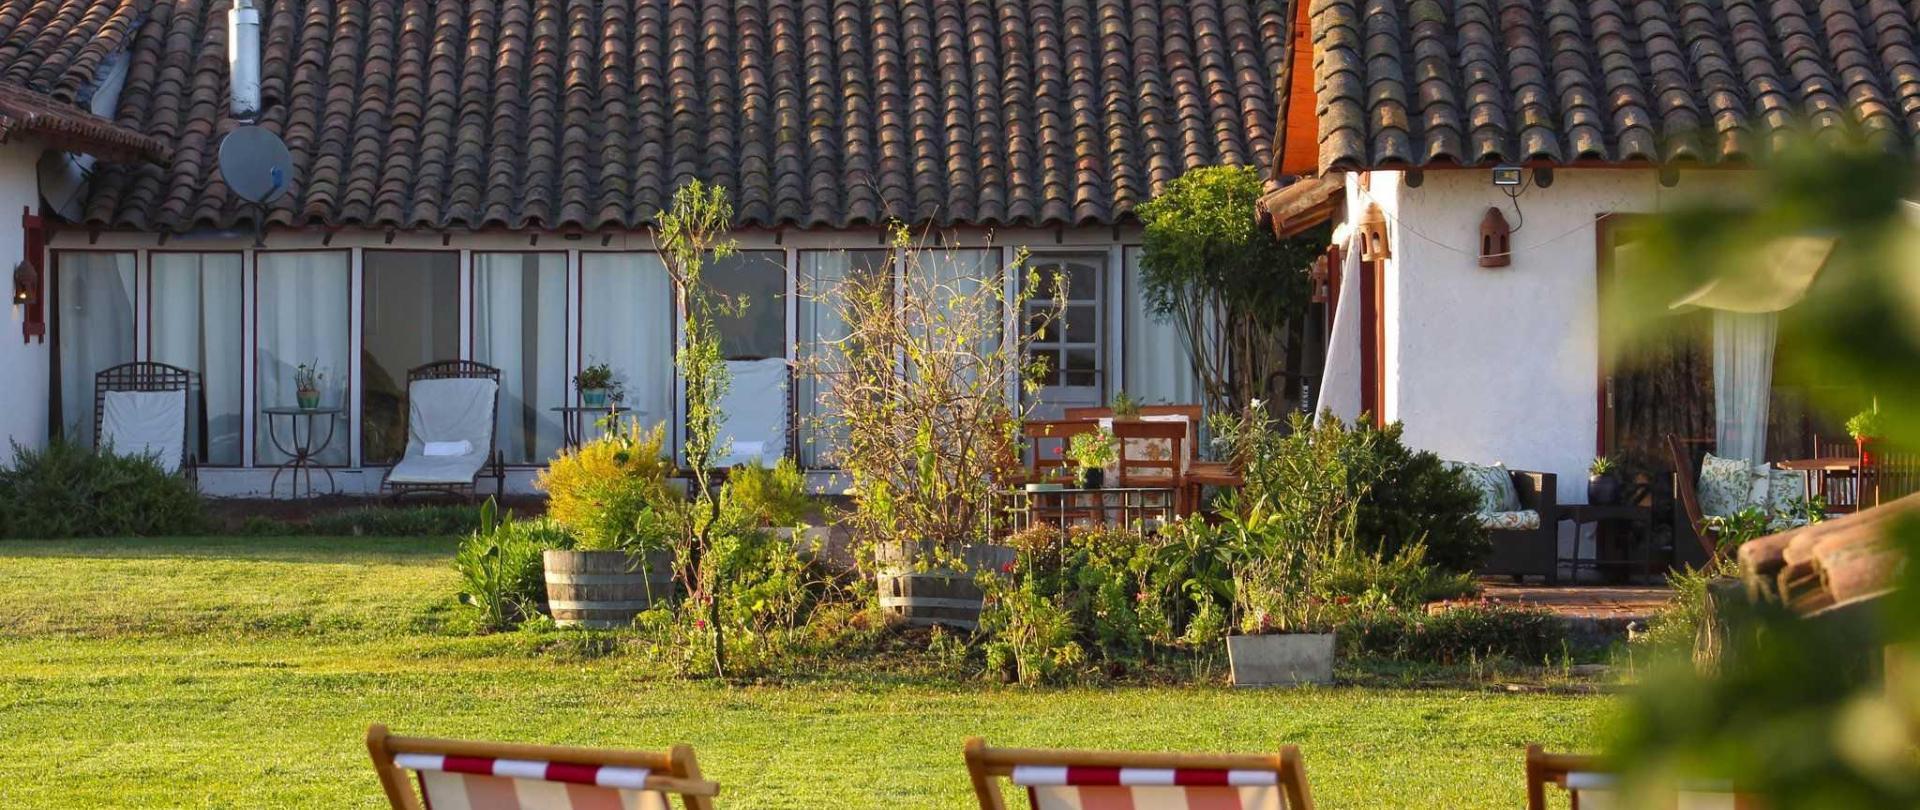 hotel-vendimia-parador-santa-cruz-valle-de-colchagua-17.jpg